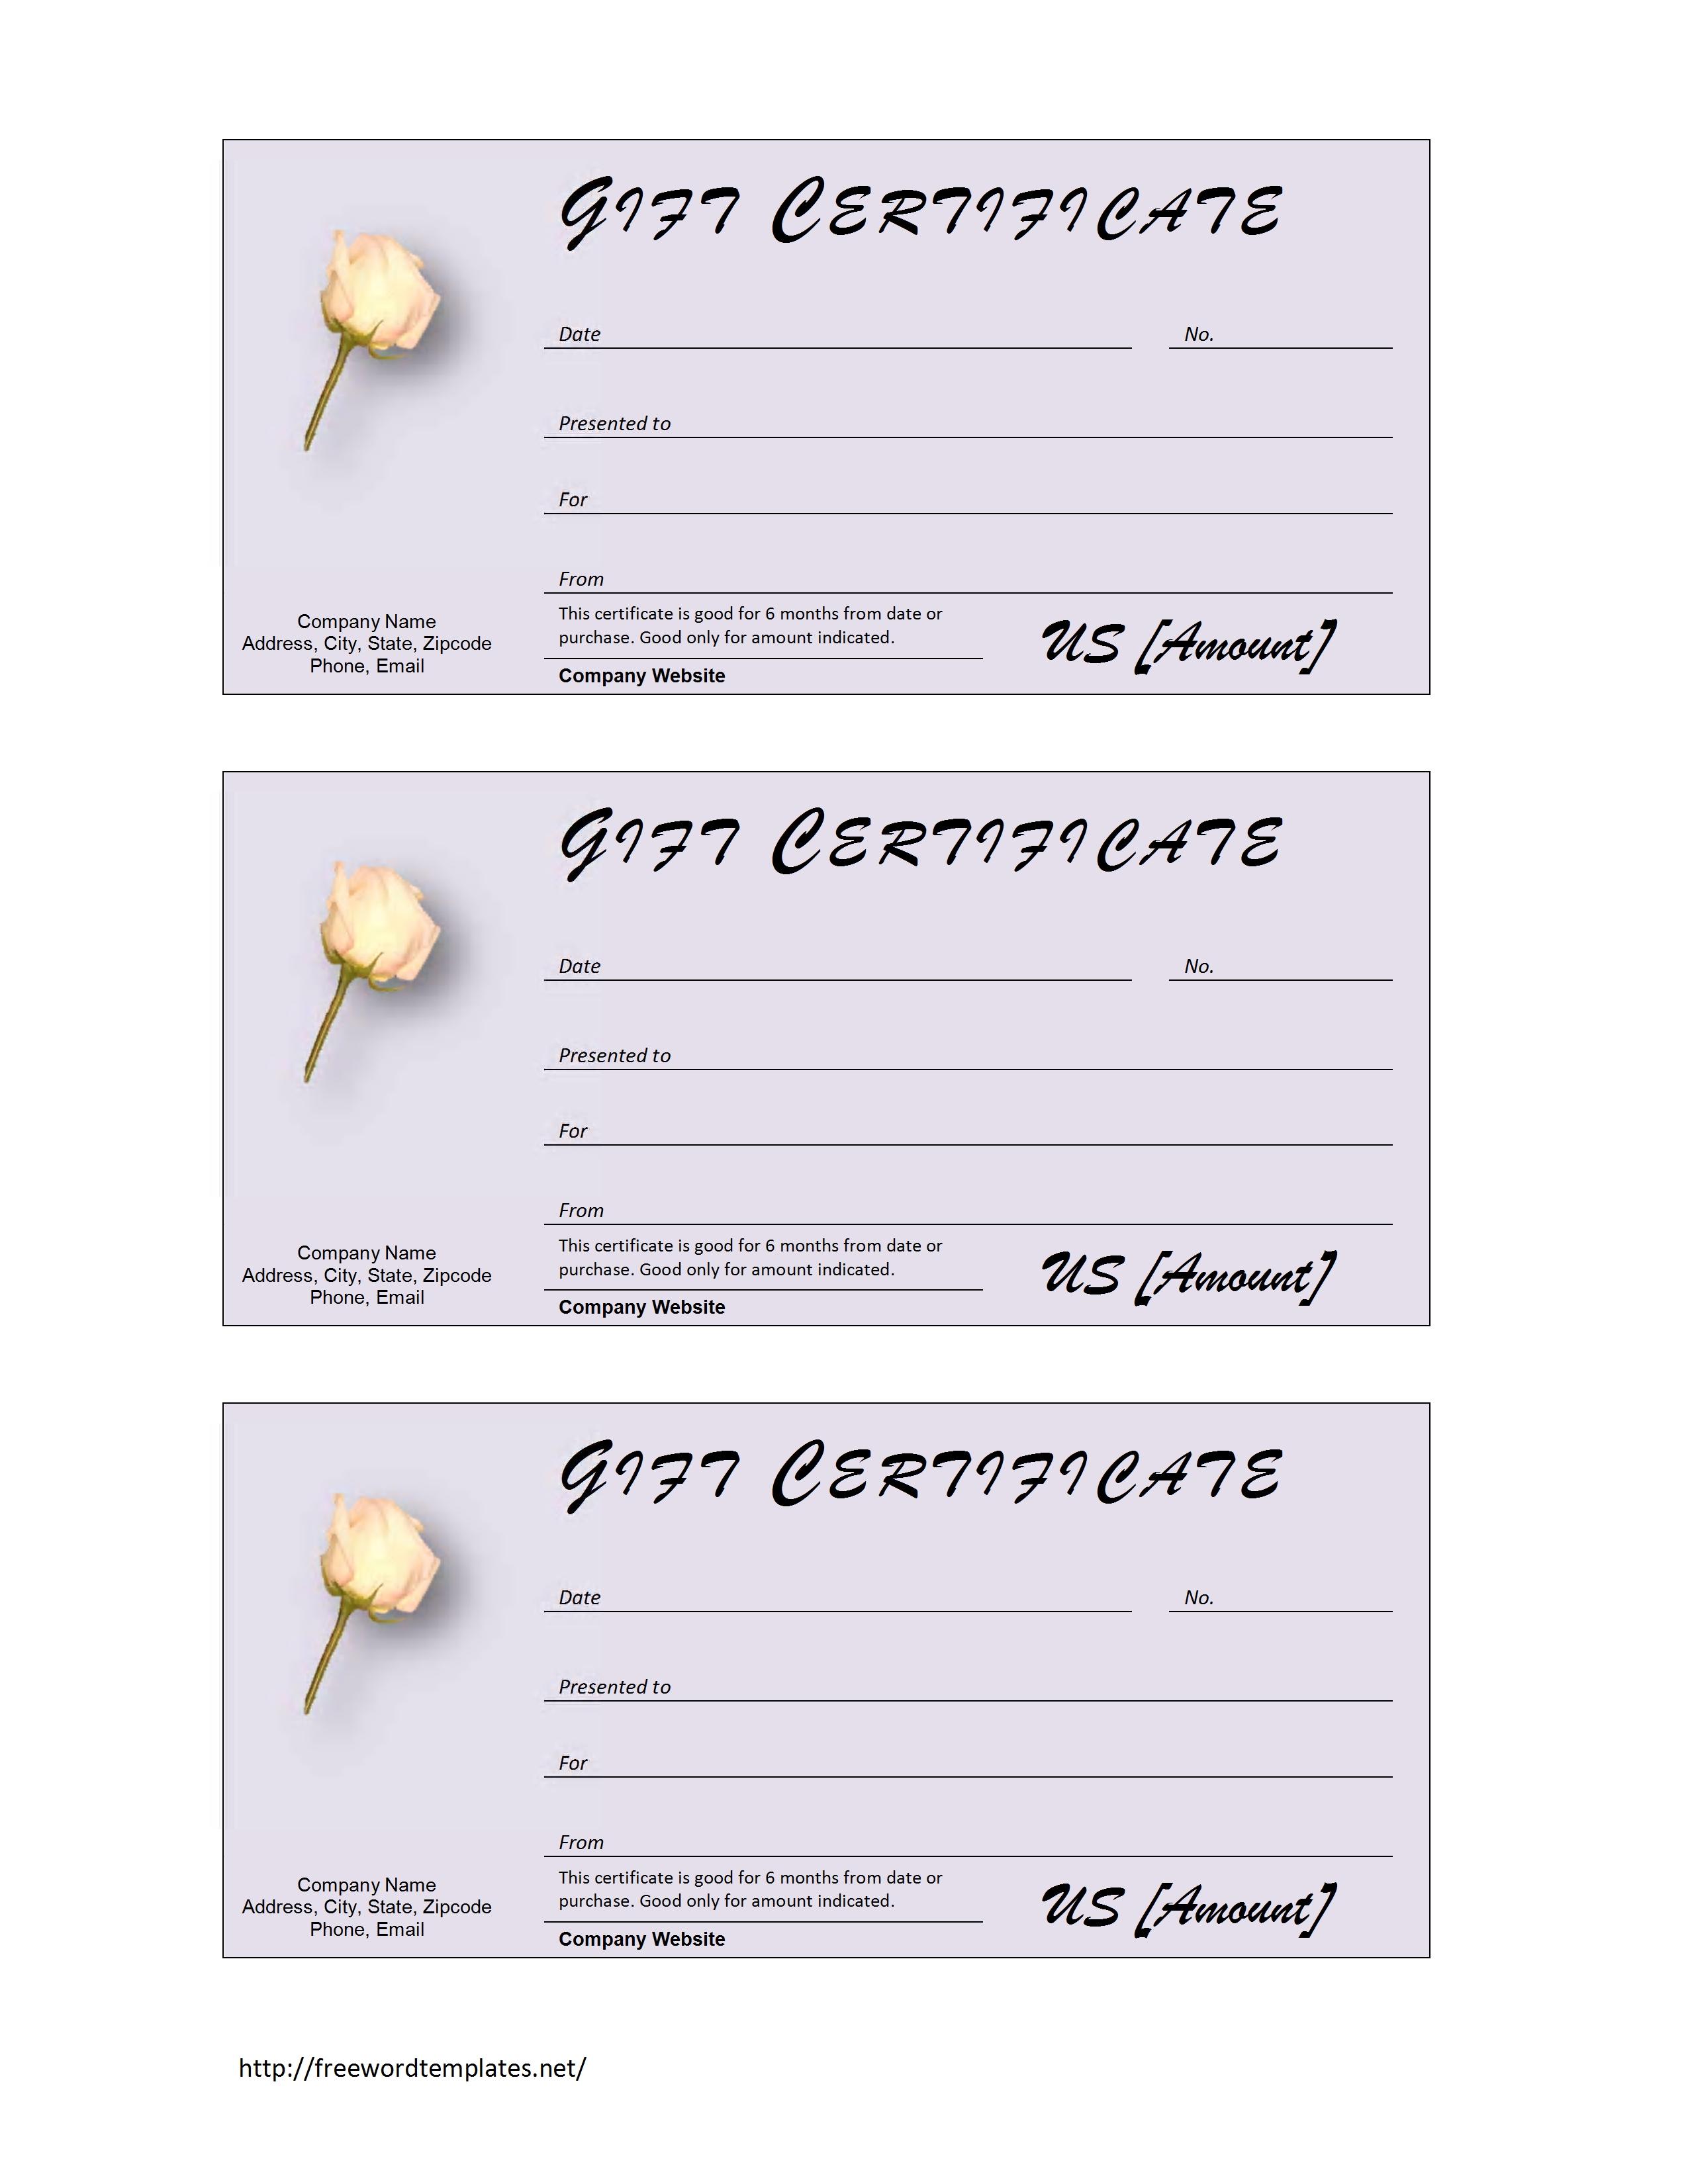 Sample Gift Certificate Template. 12 sample blank gift certificate ...